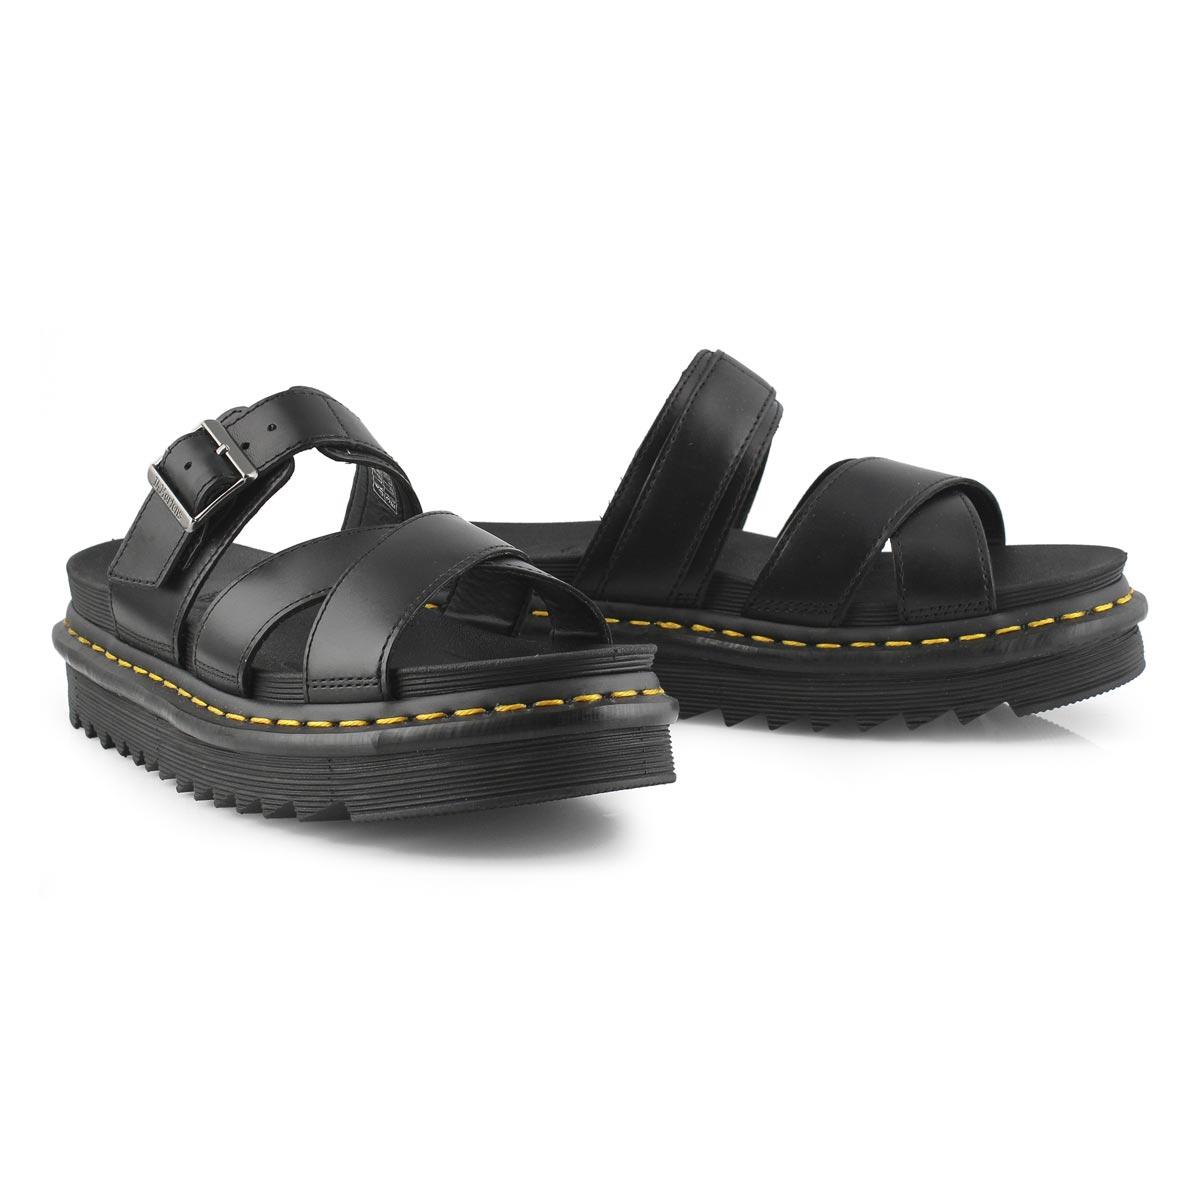 Lds Ryker black 3 strap casual sandal